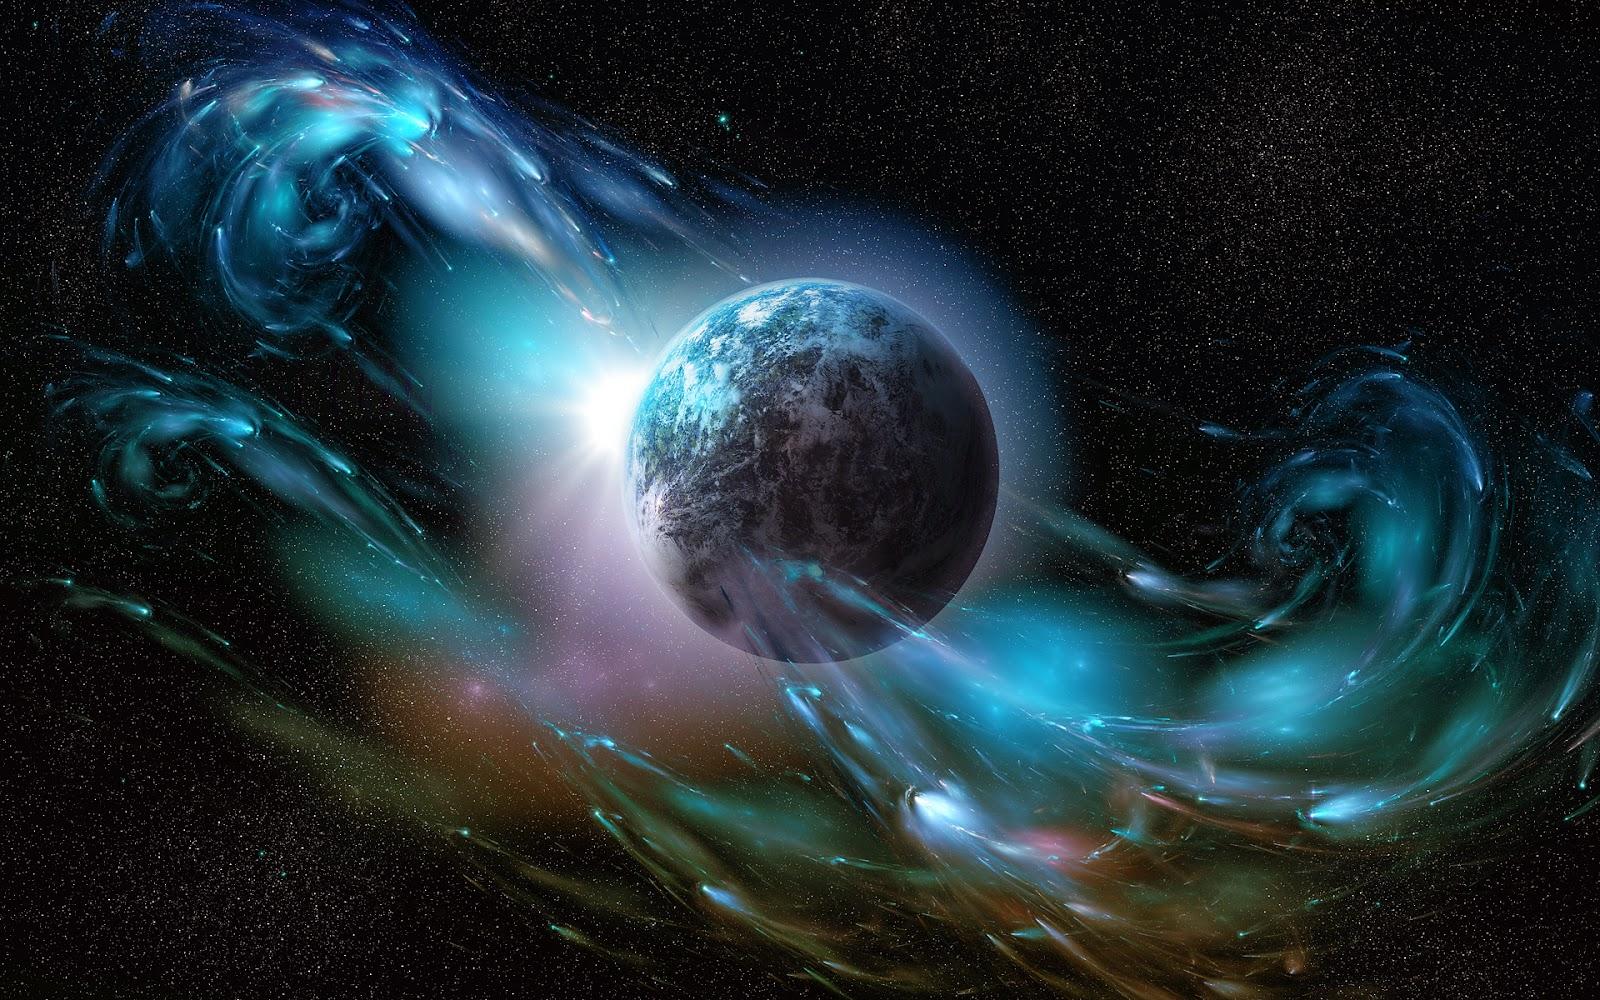 earth magnetic portals - hidden, ενεργειακές πύλες στο μαγνητικό πεδίο της γης